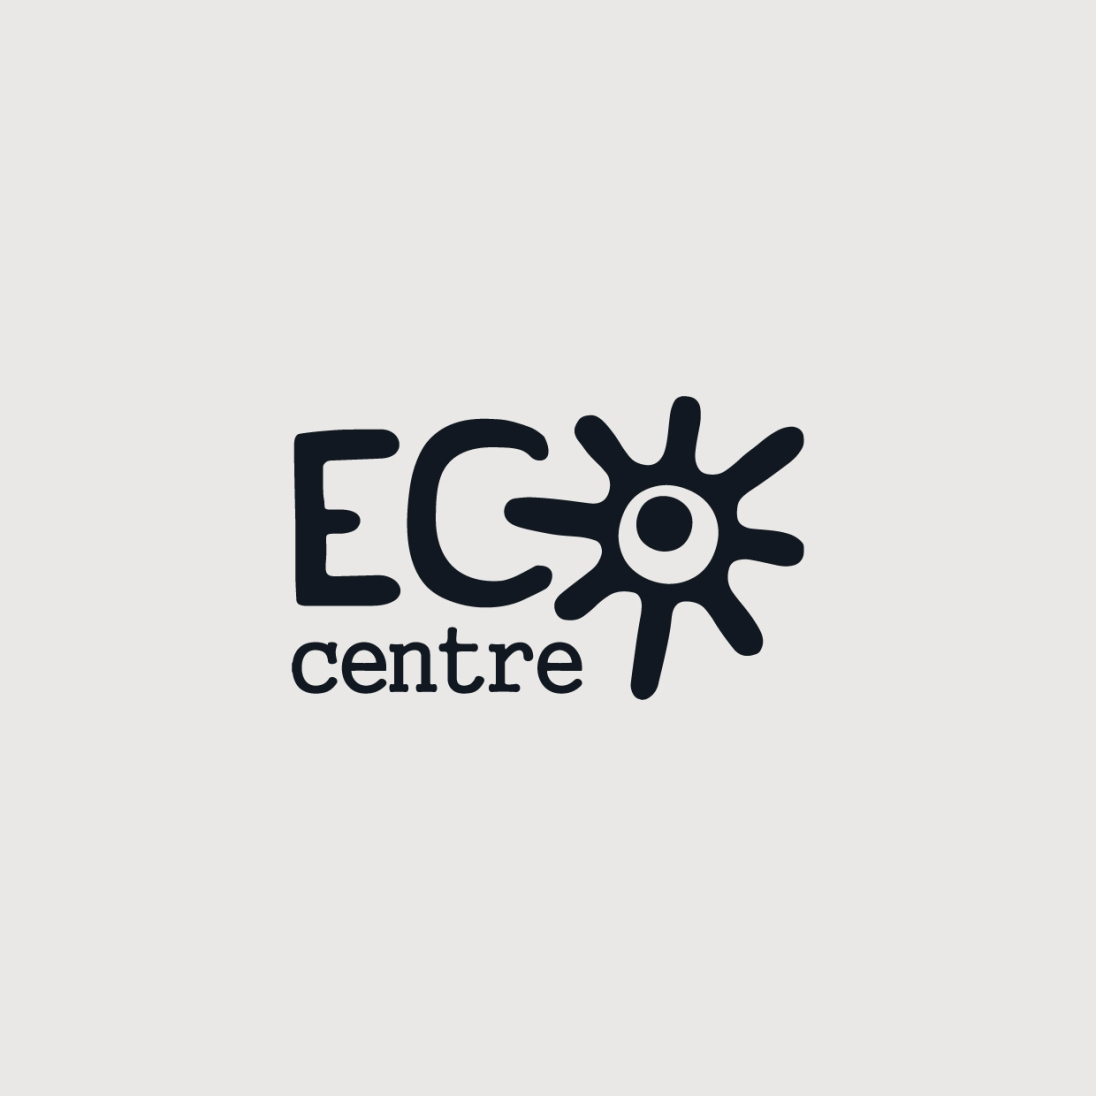 Marca EcoCentre